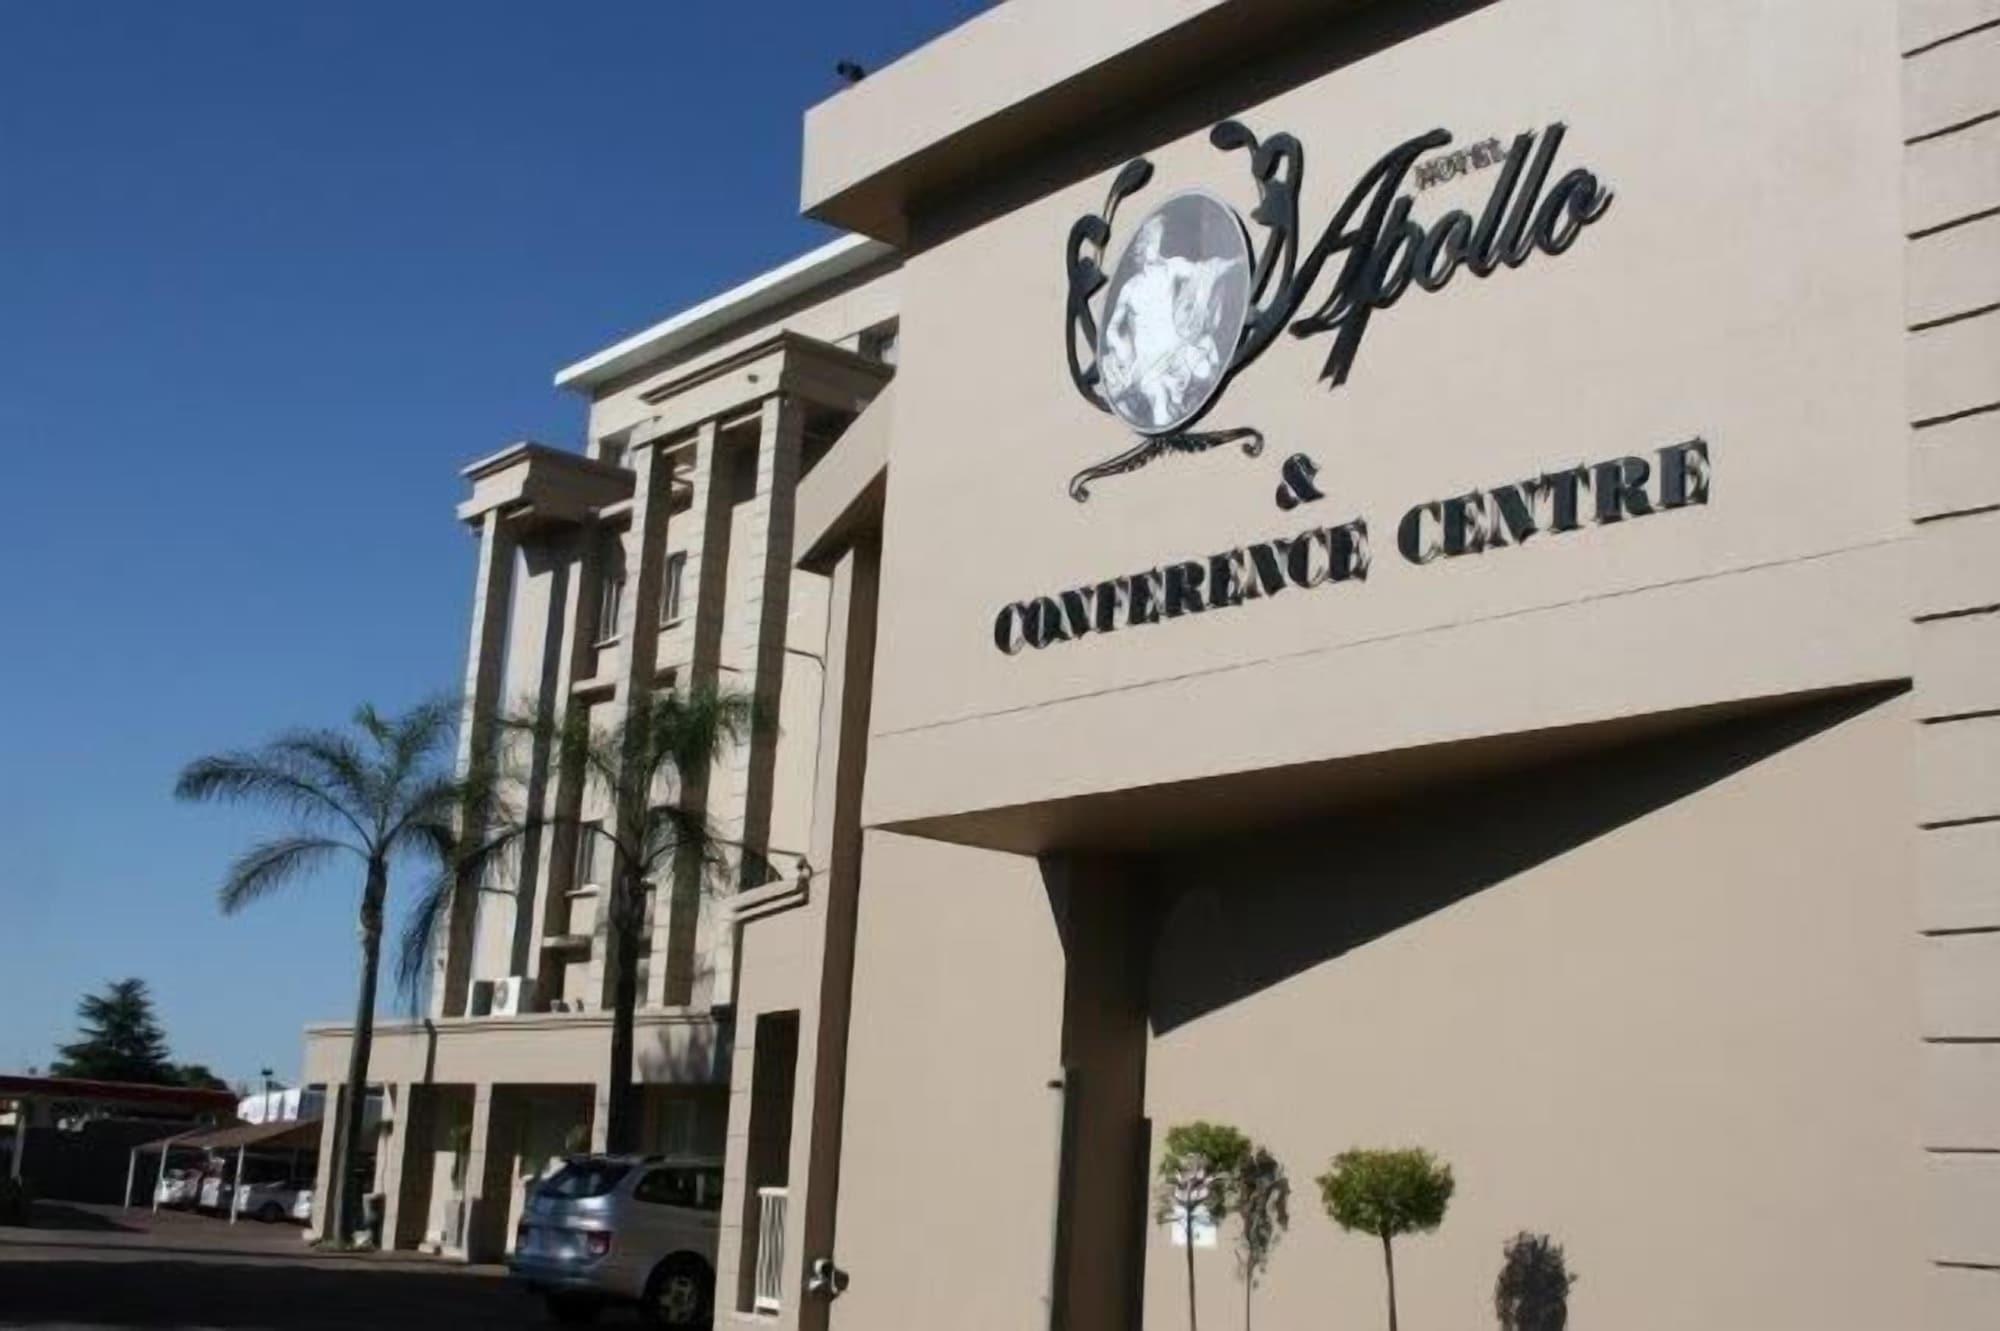 Apollo Hotel, City of Johannesburg